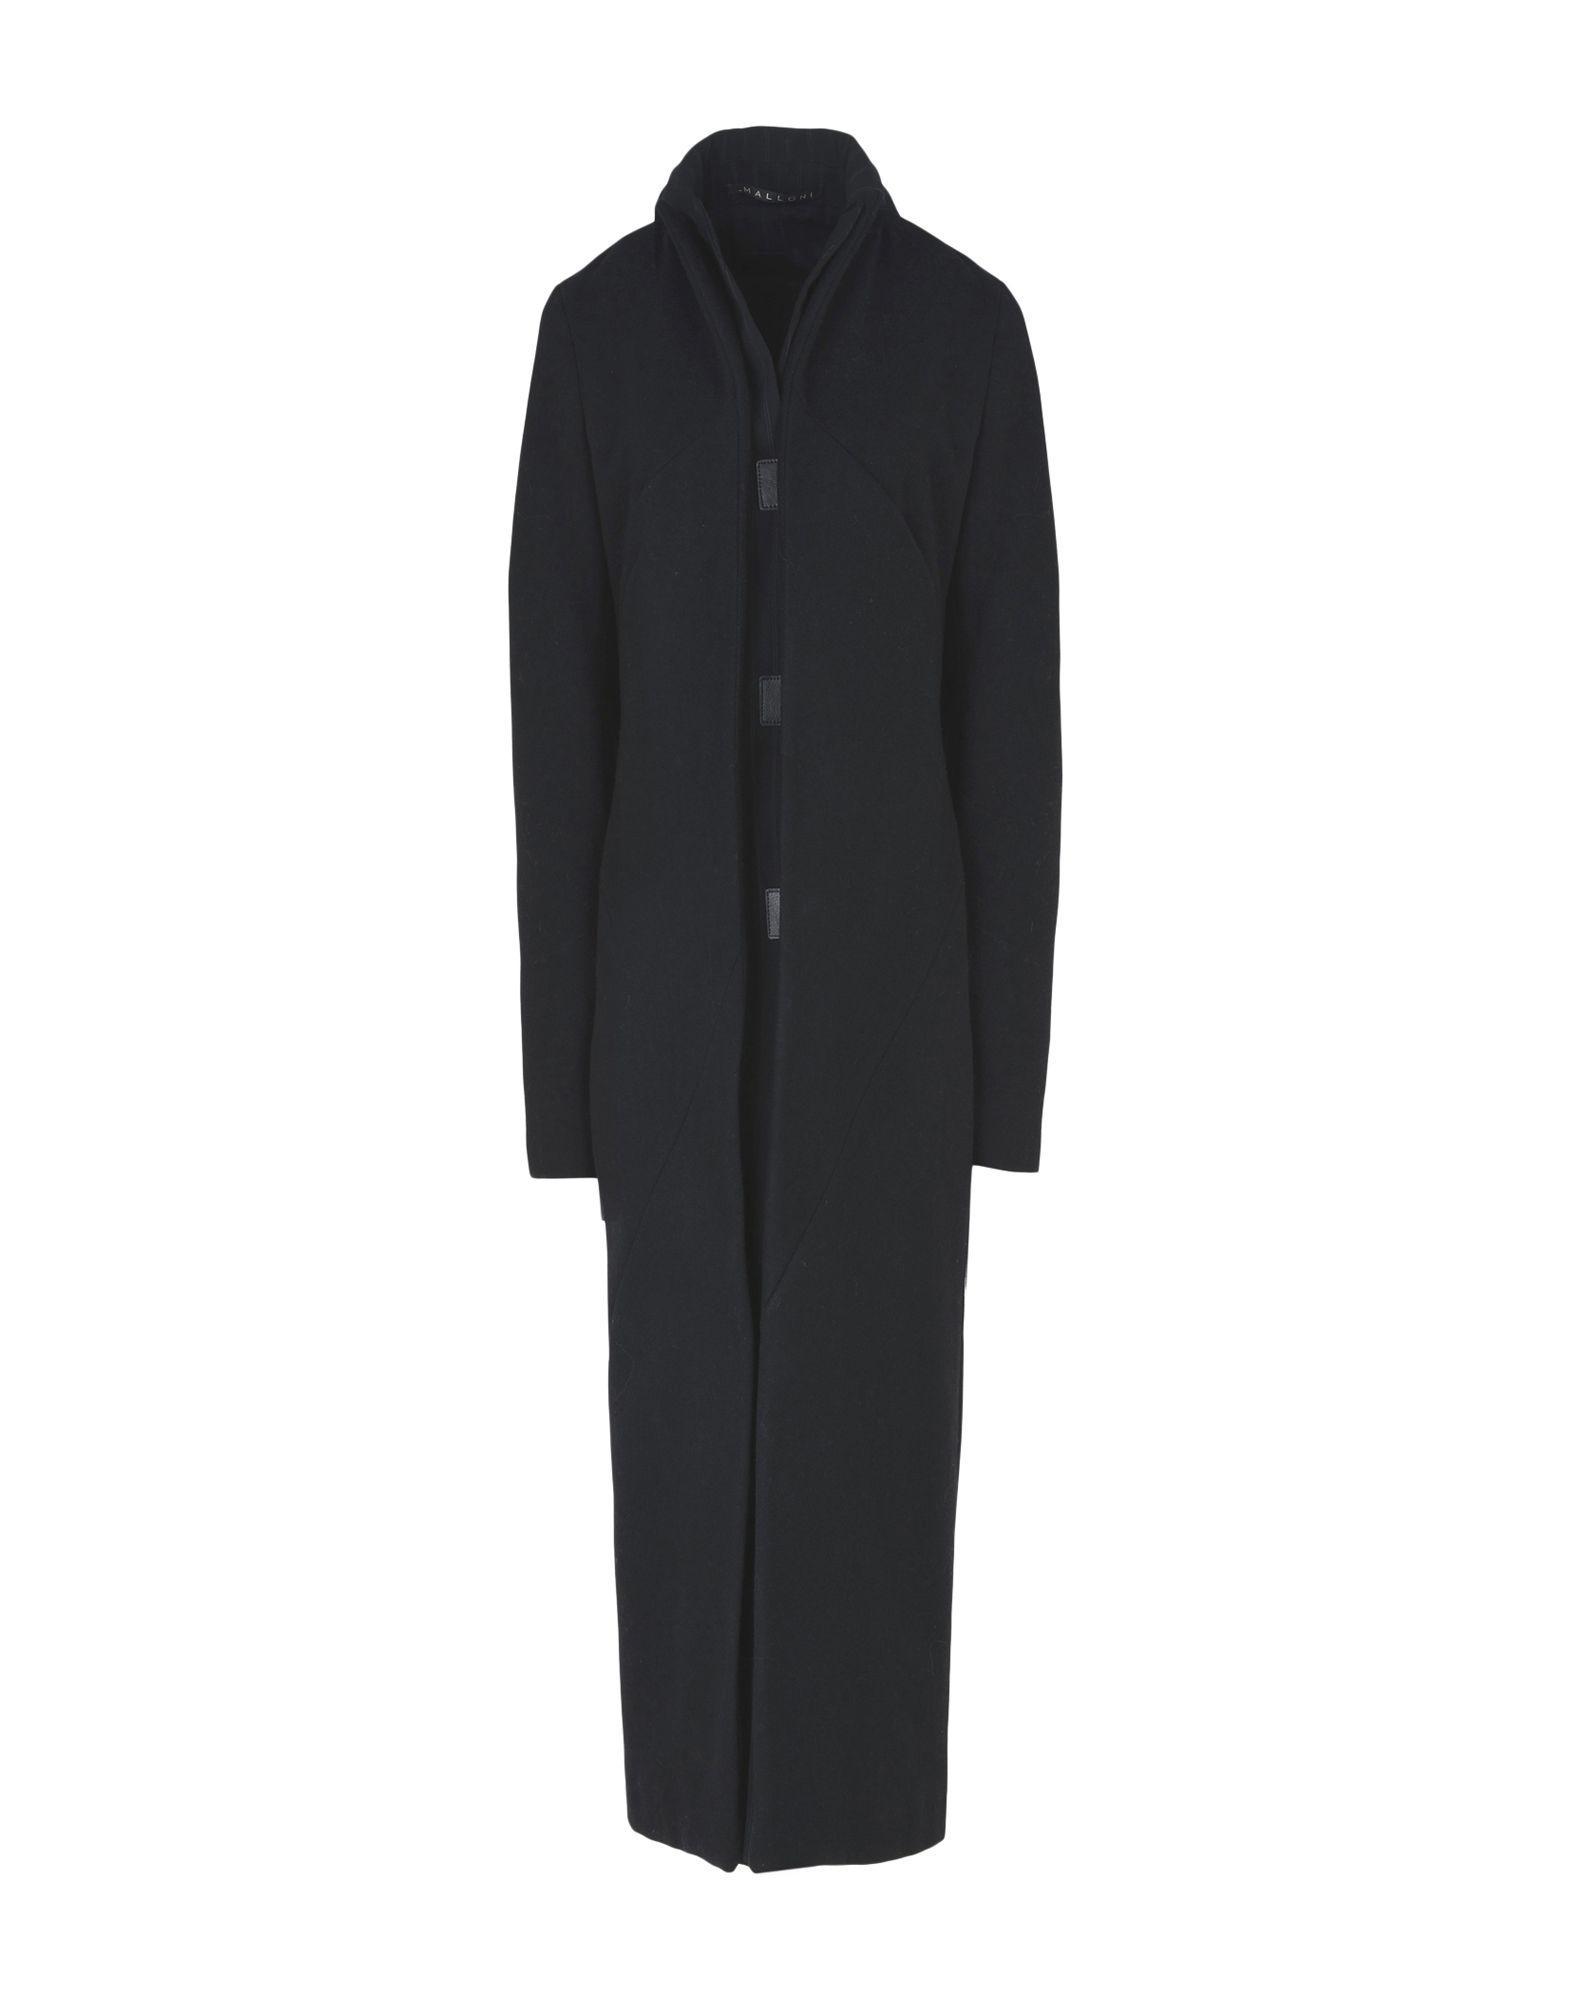 Malloni Coats In Black